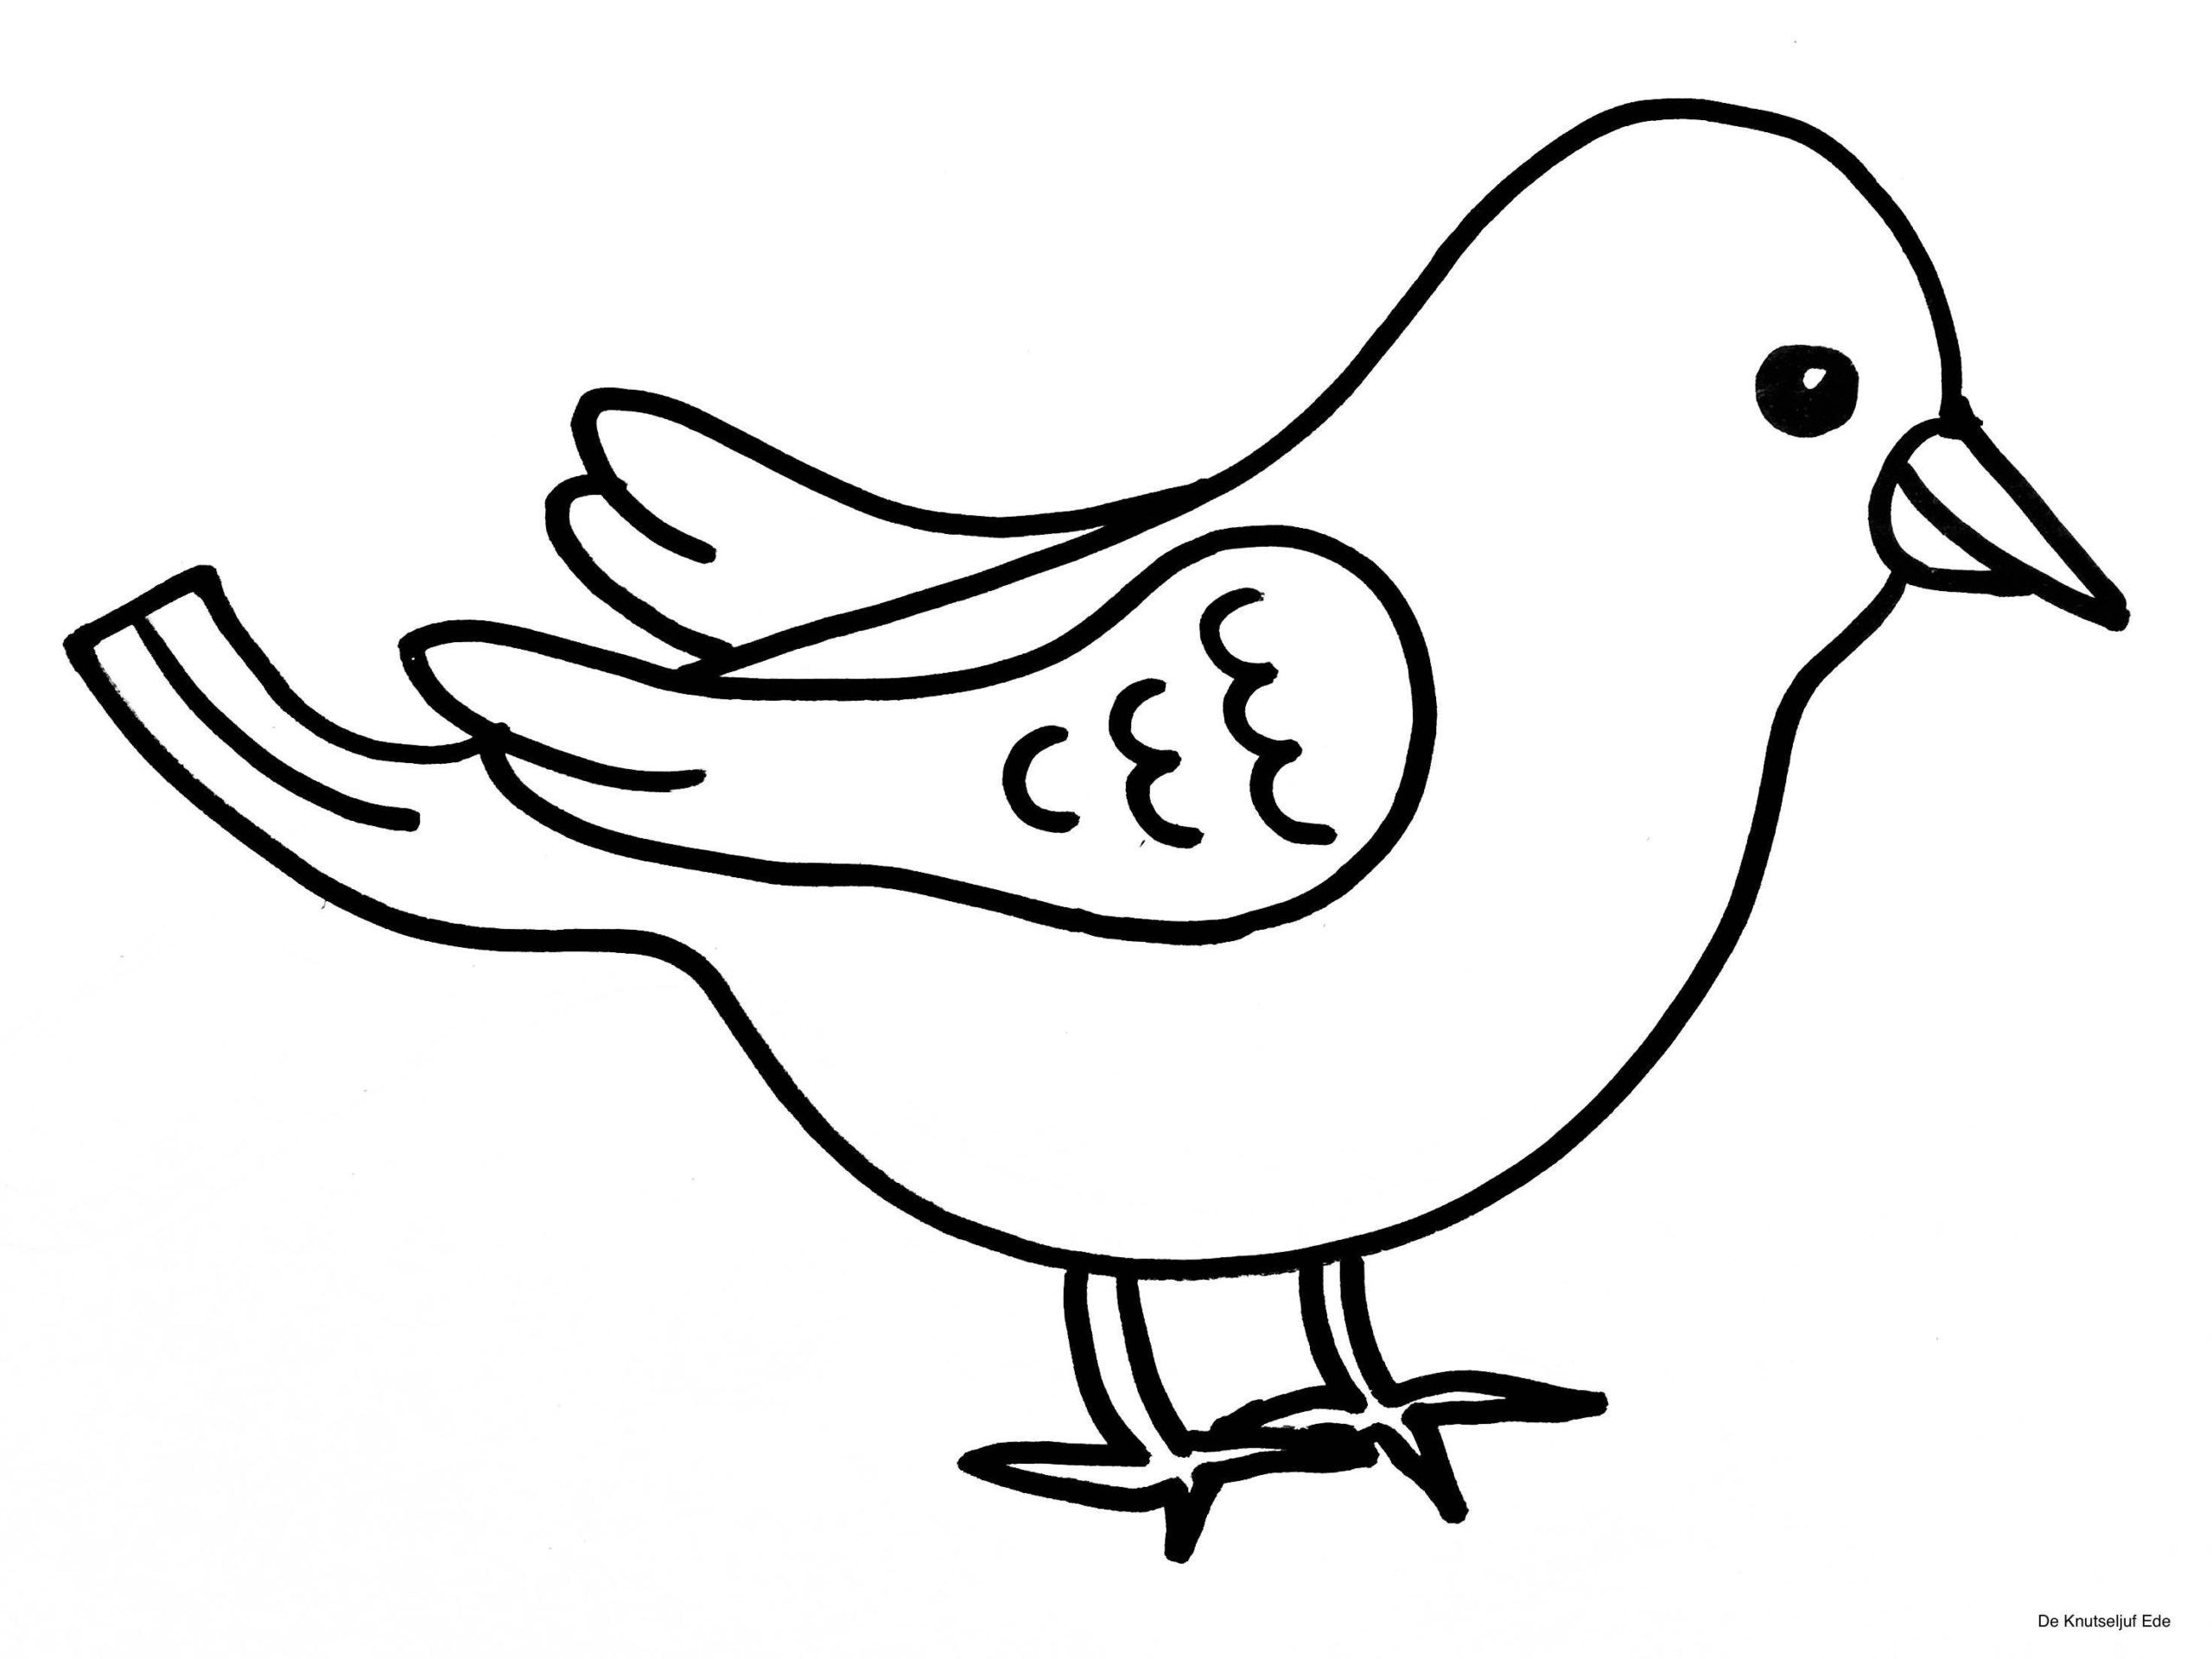 Vögel färben ausmalbilder ausmalbilder vögel ausmalbilder